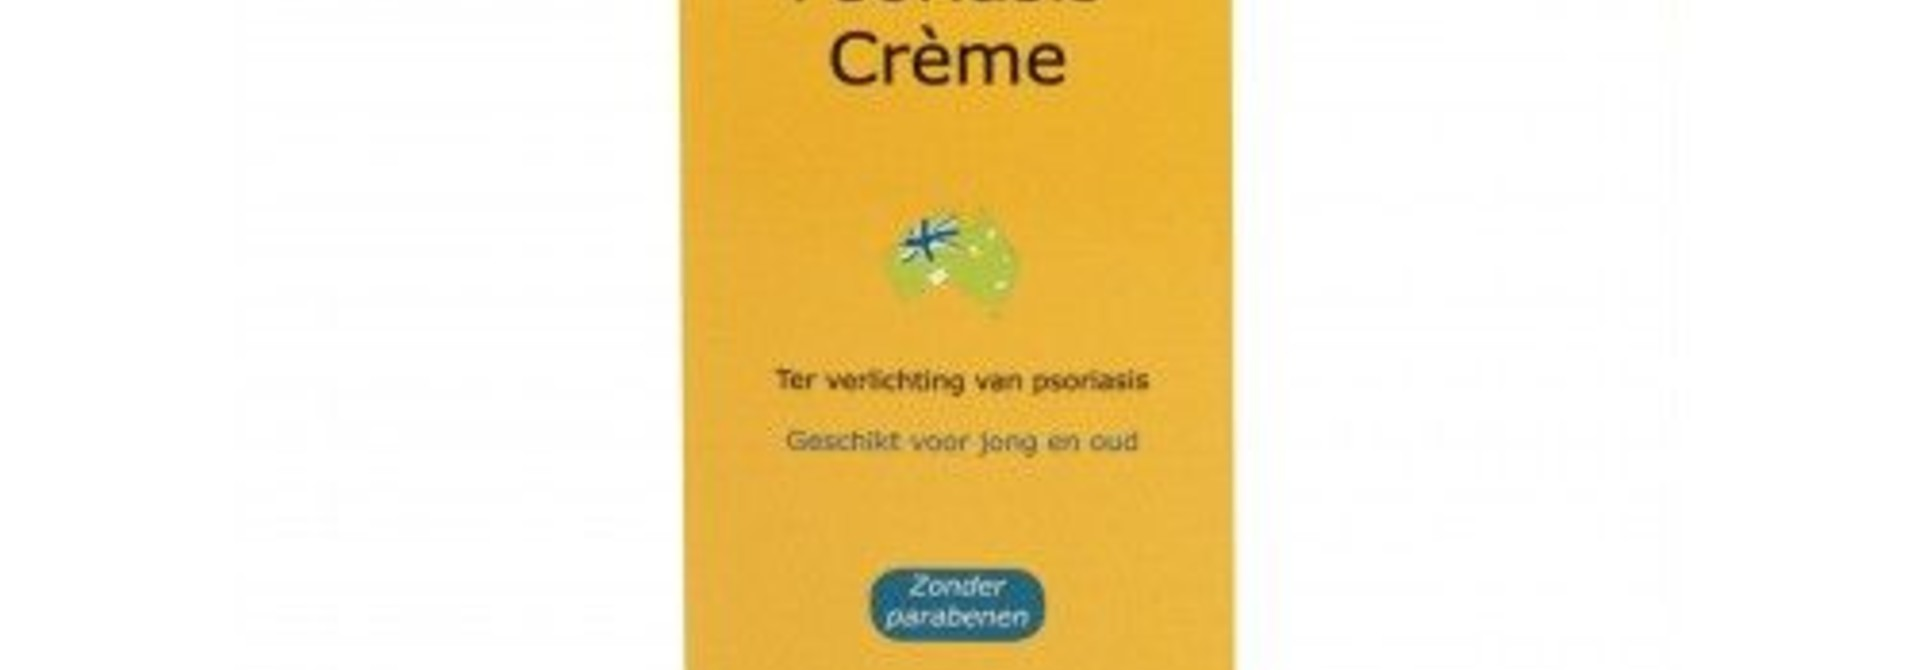 Psoriasis creme 75 gram